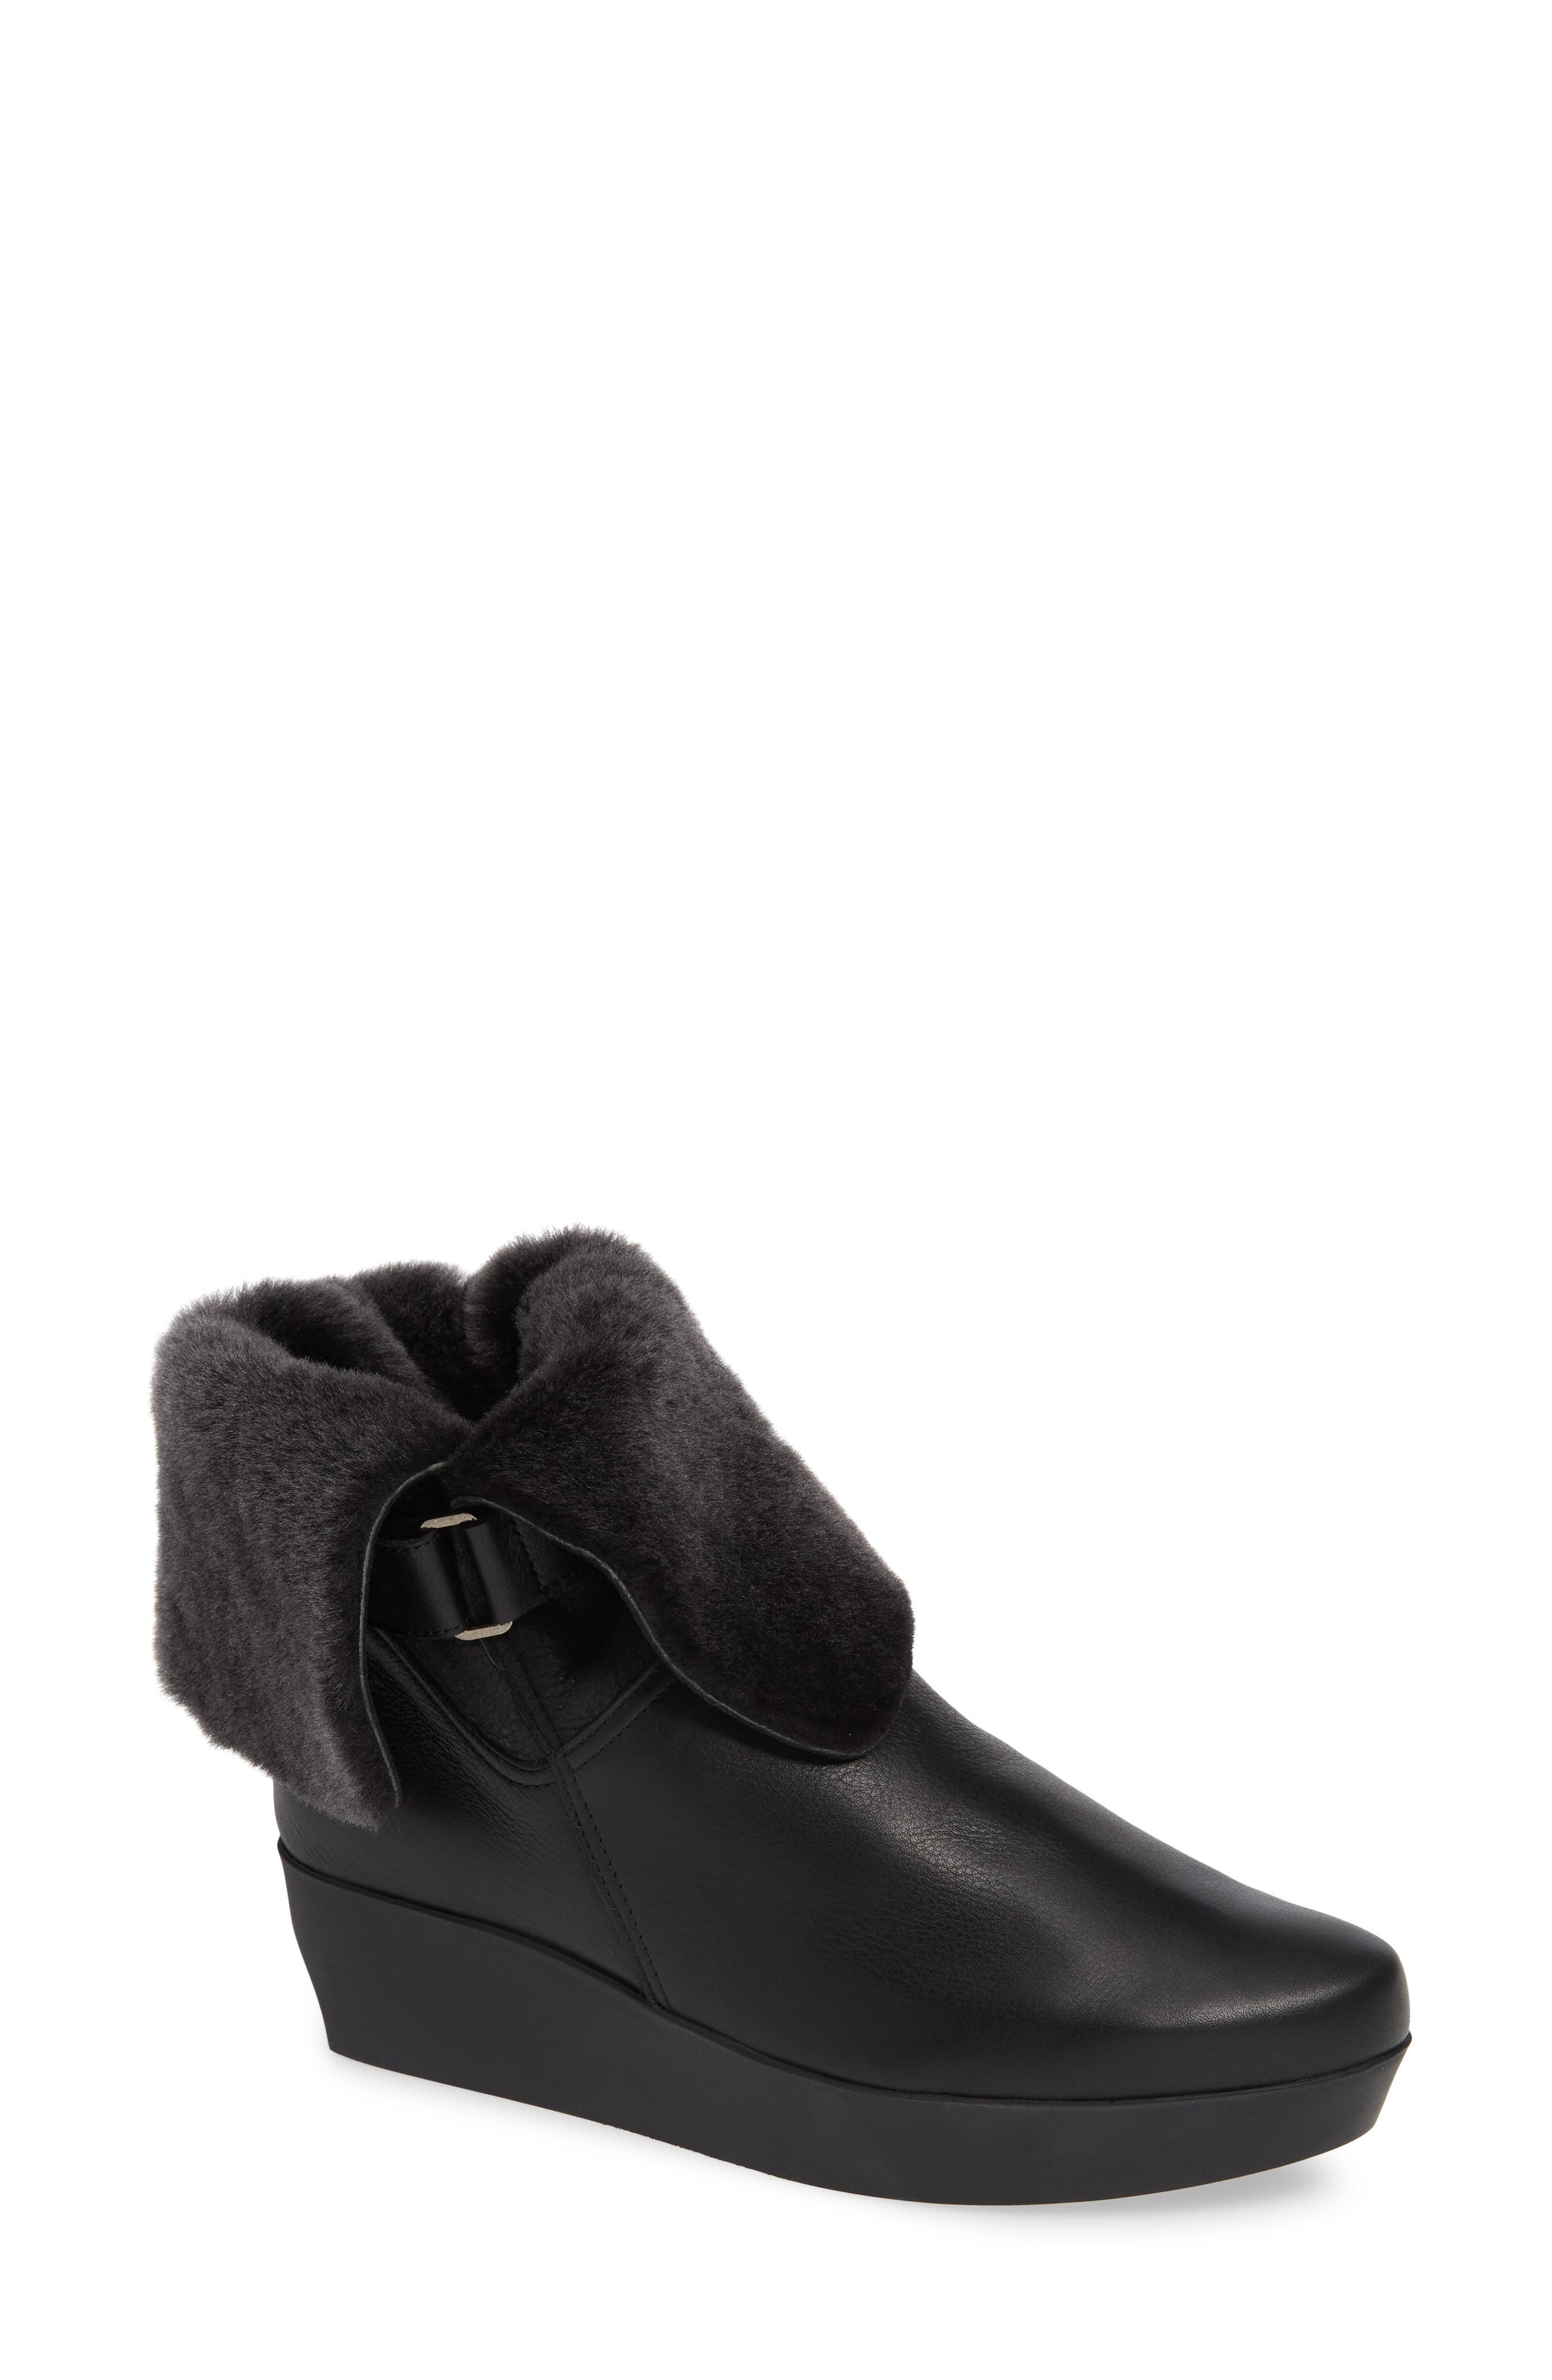 ARCHE Fujosc Genuine Shearling Bootie in Noir Leather